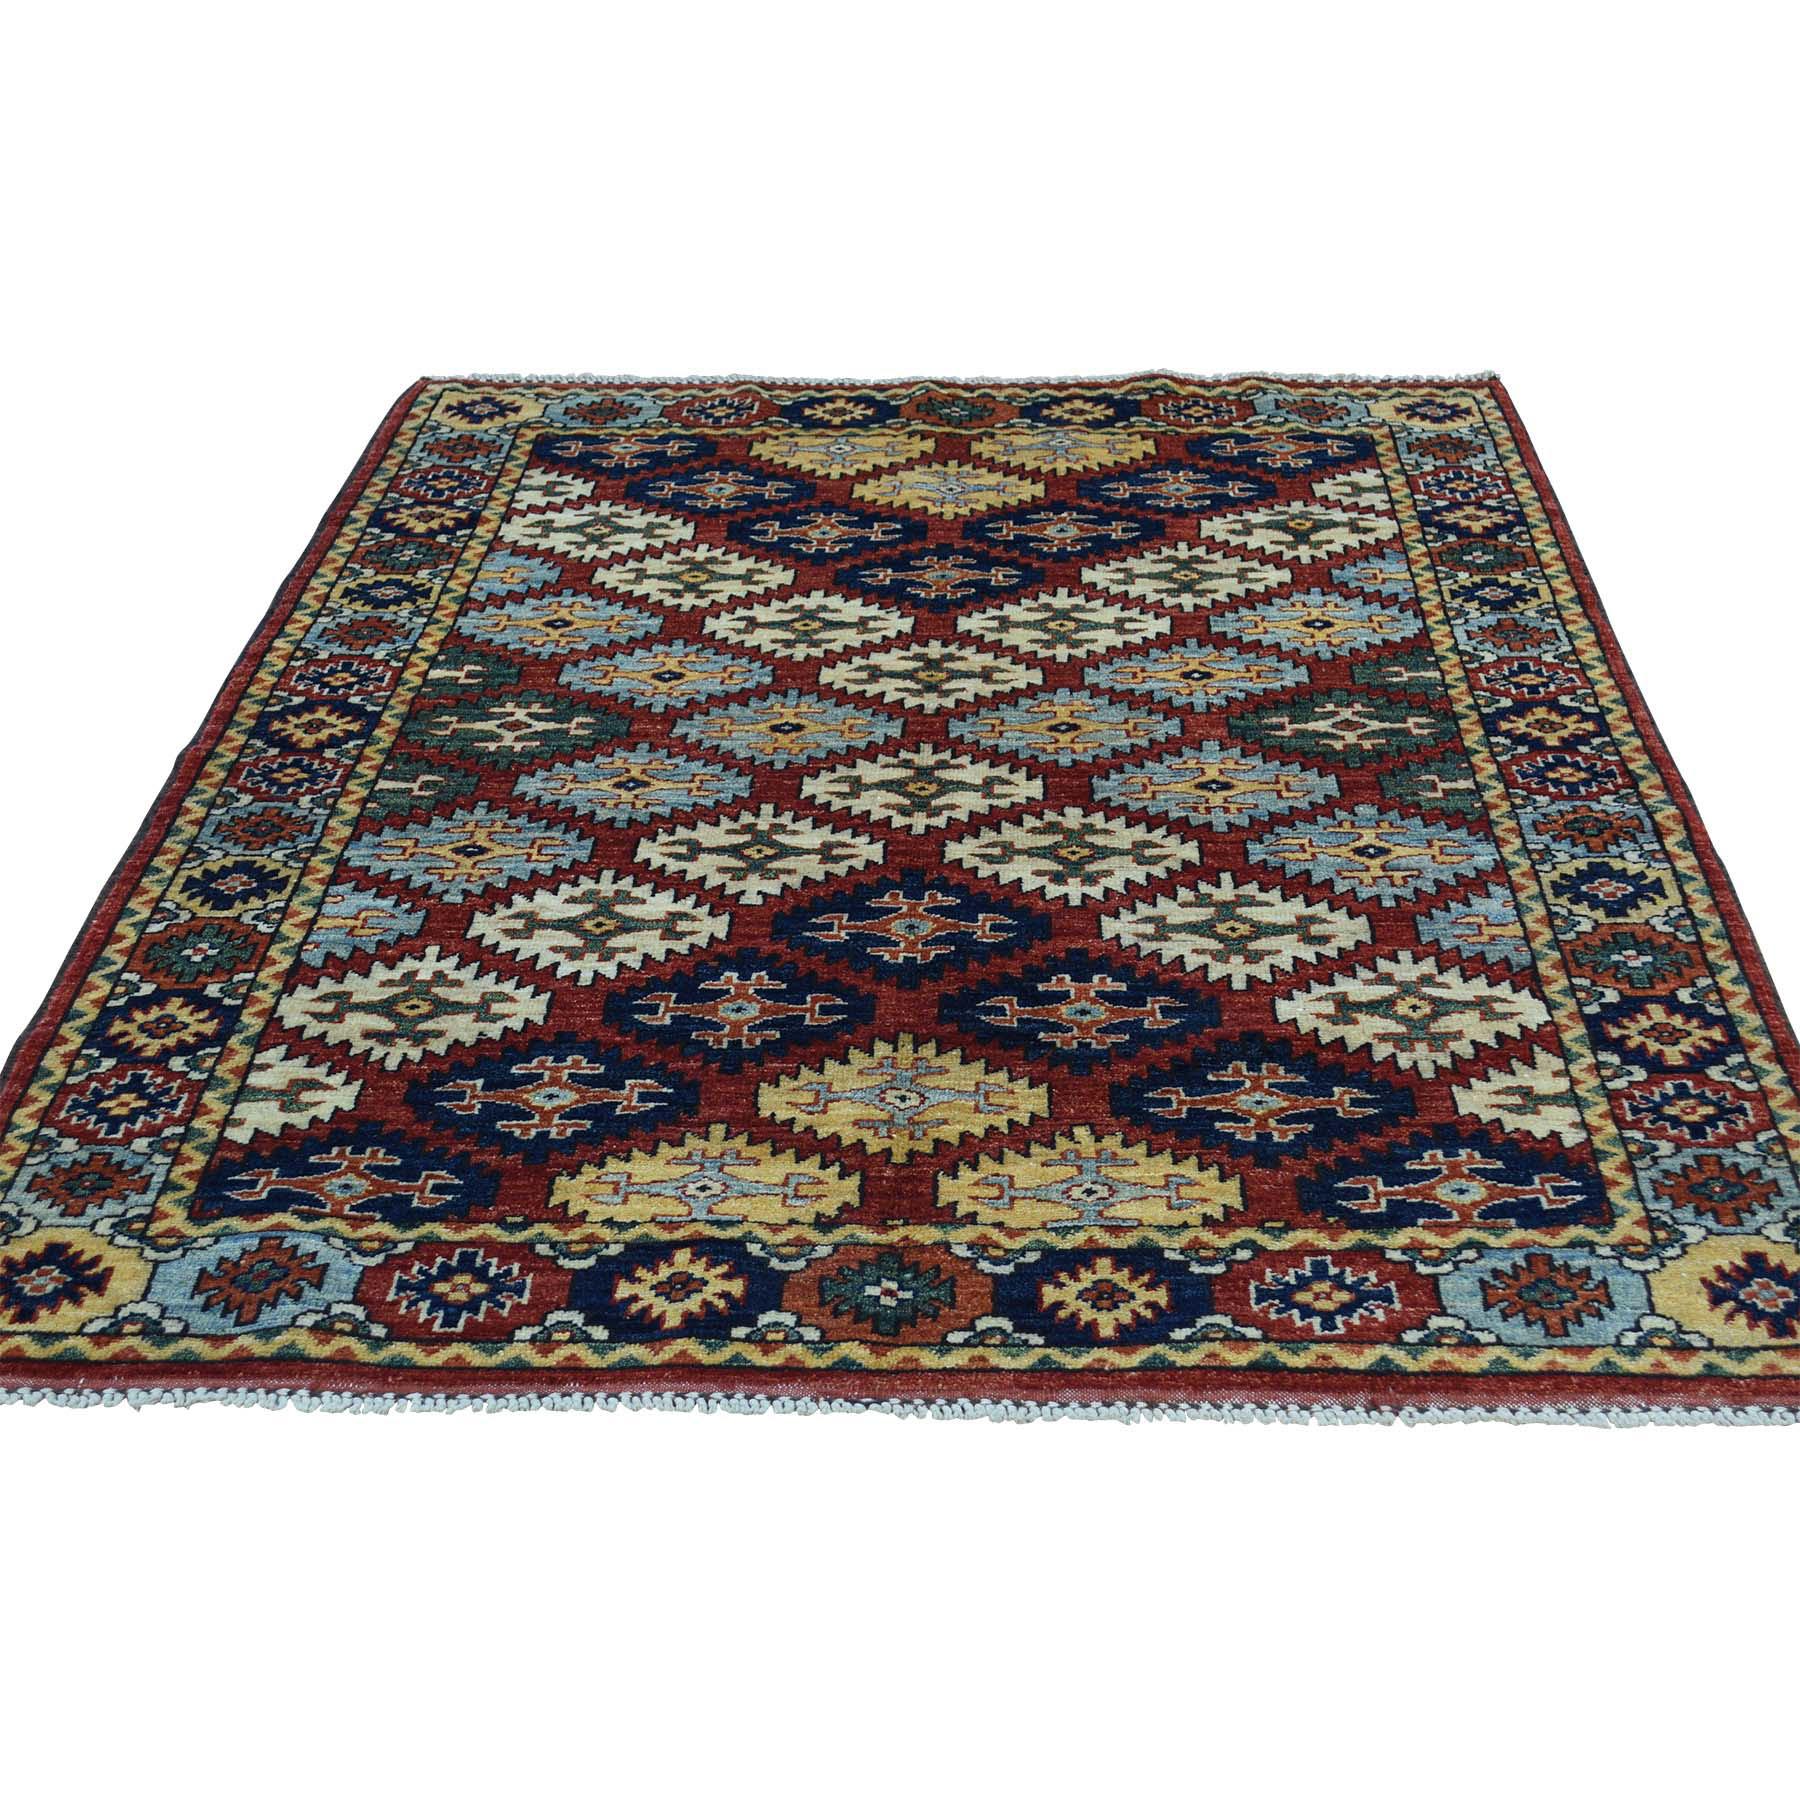 4'X6' Hand Knotted Turkoman Ersari 100 Percent Wool Oriental Rug moaceedc